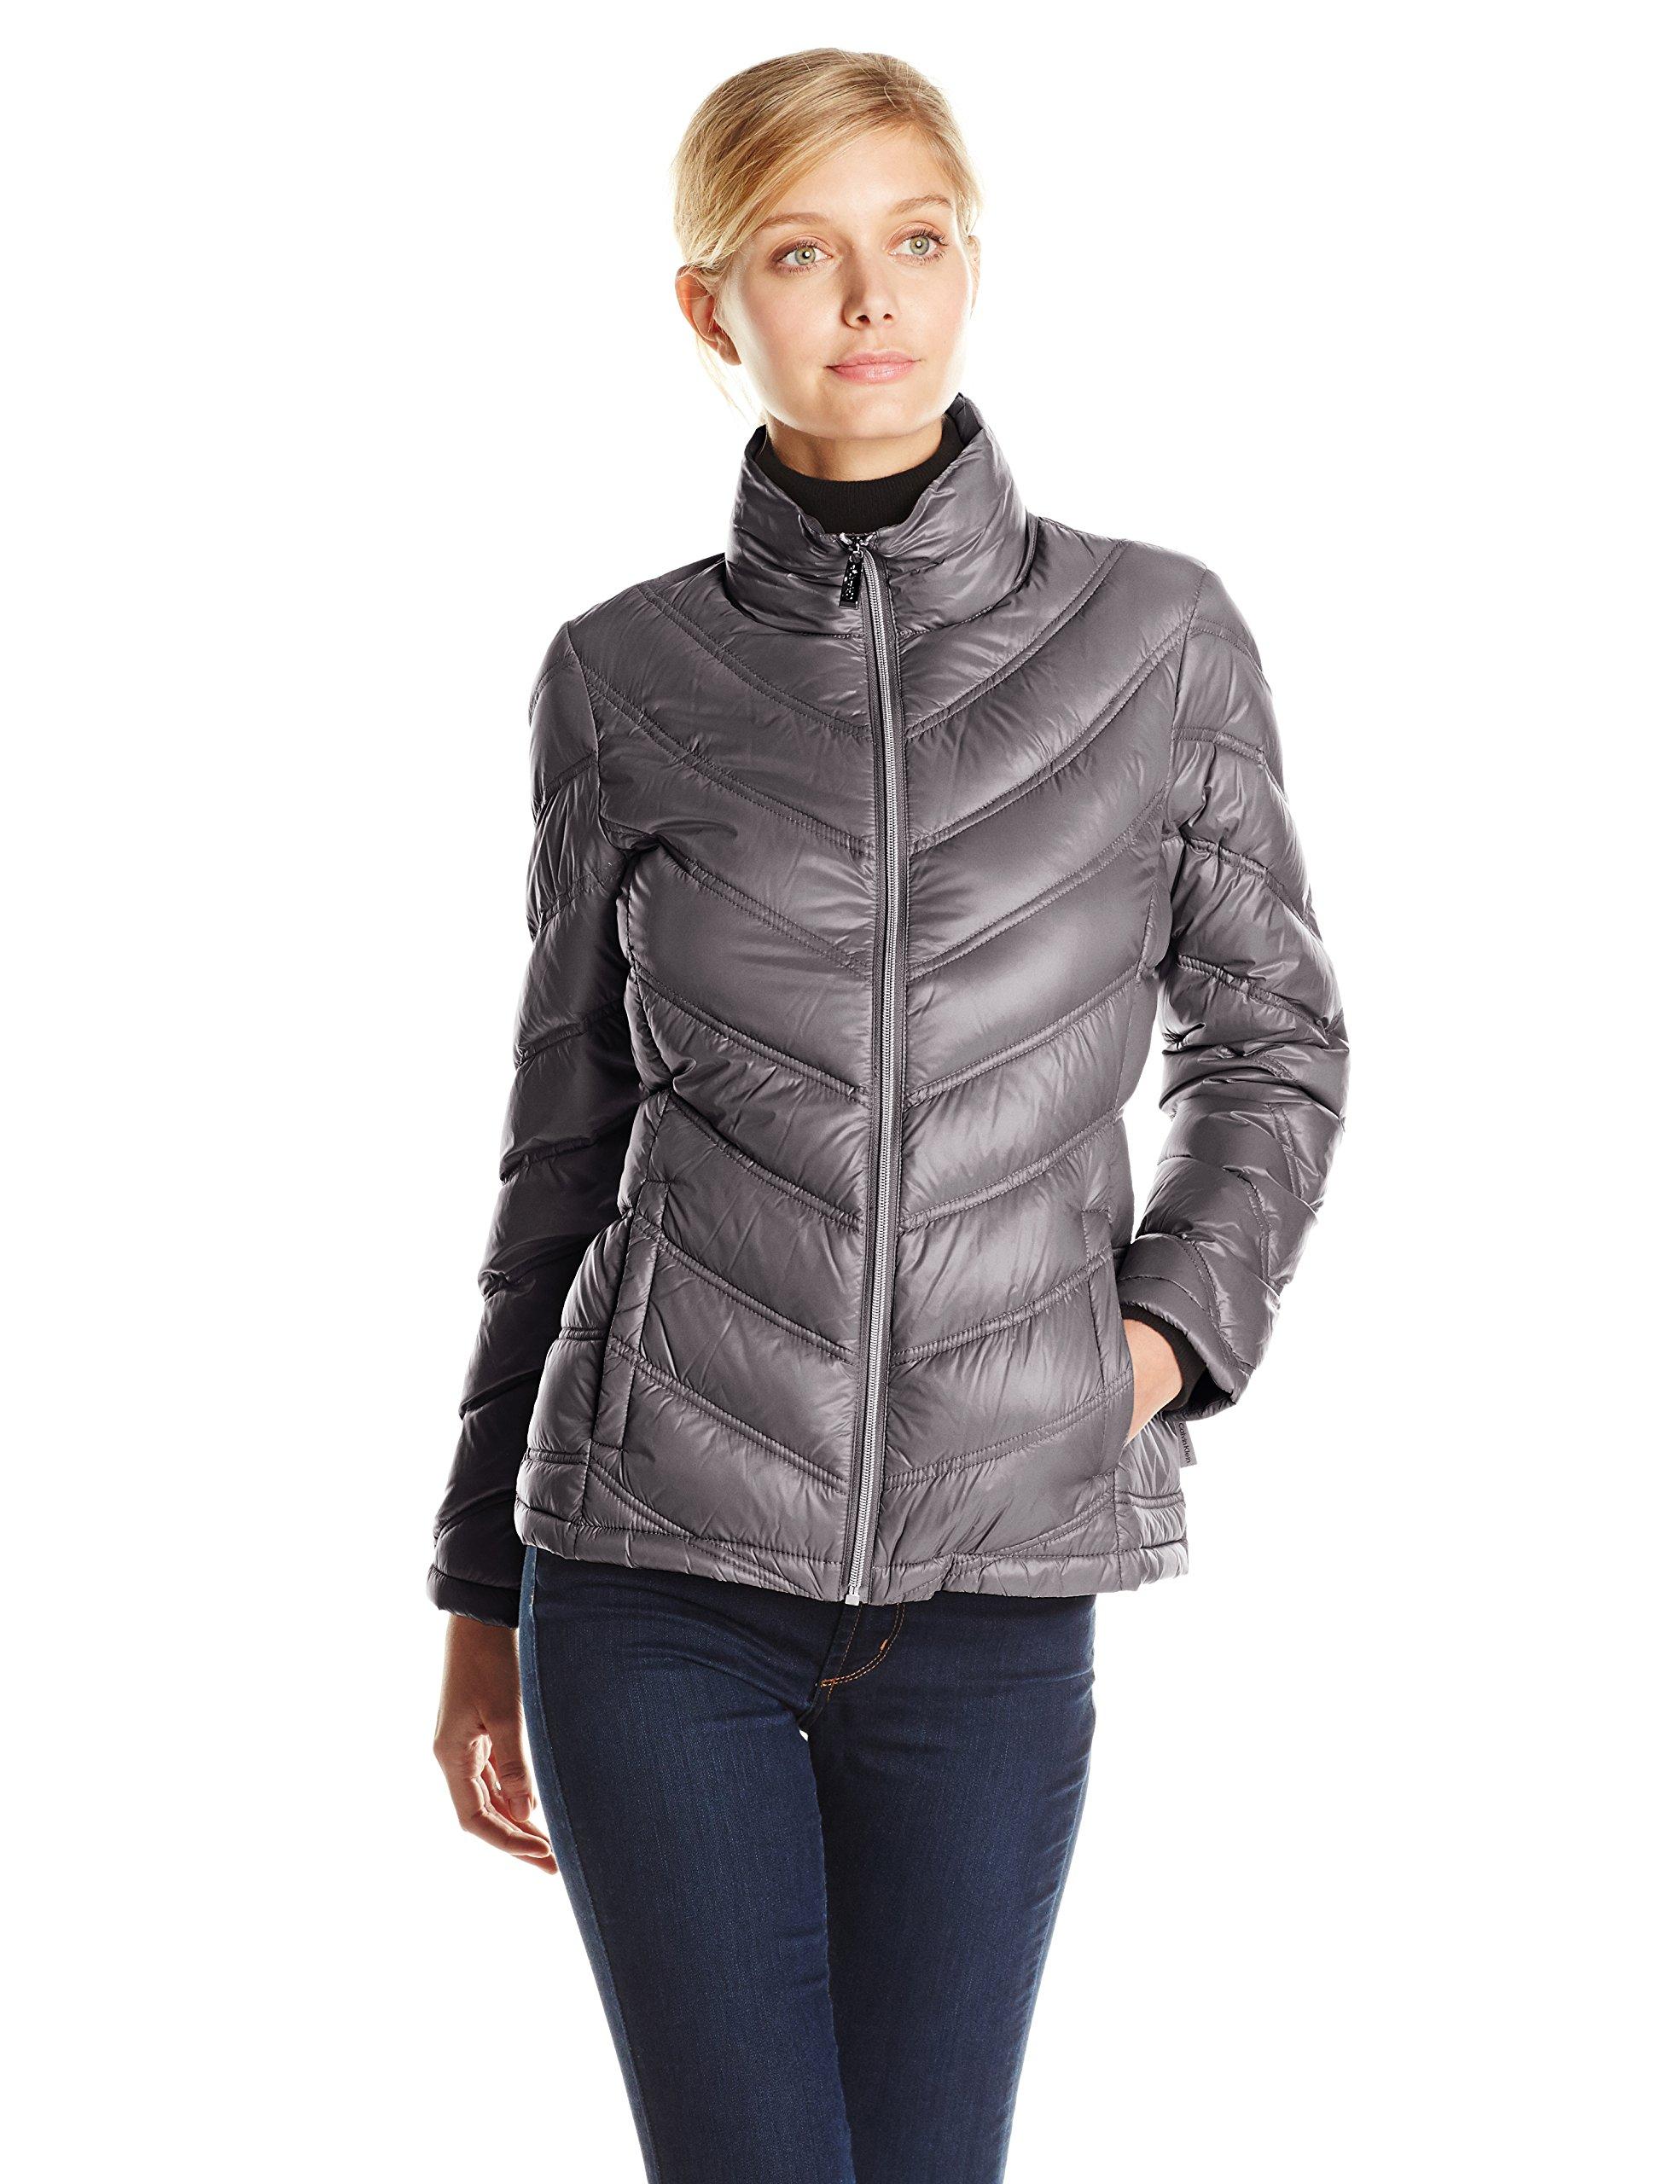 Calvin Klein Women's Lightweight Chevron Packable Jacket, Titanium, Medium